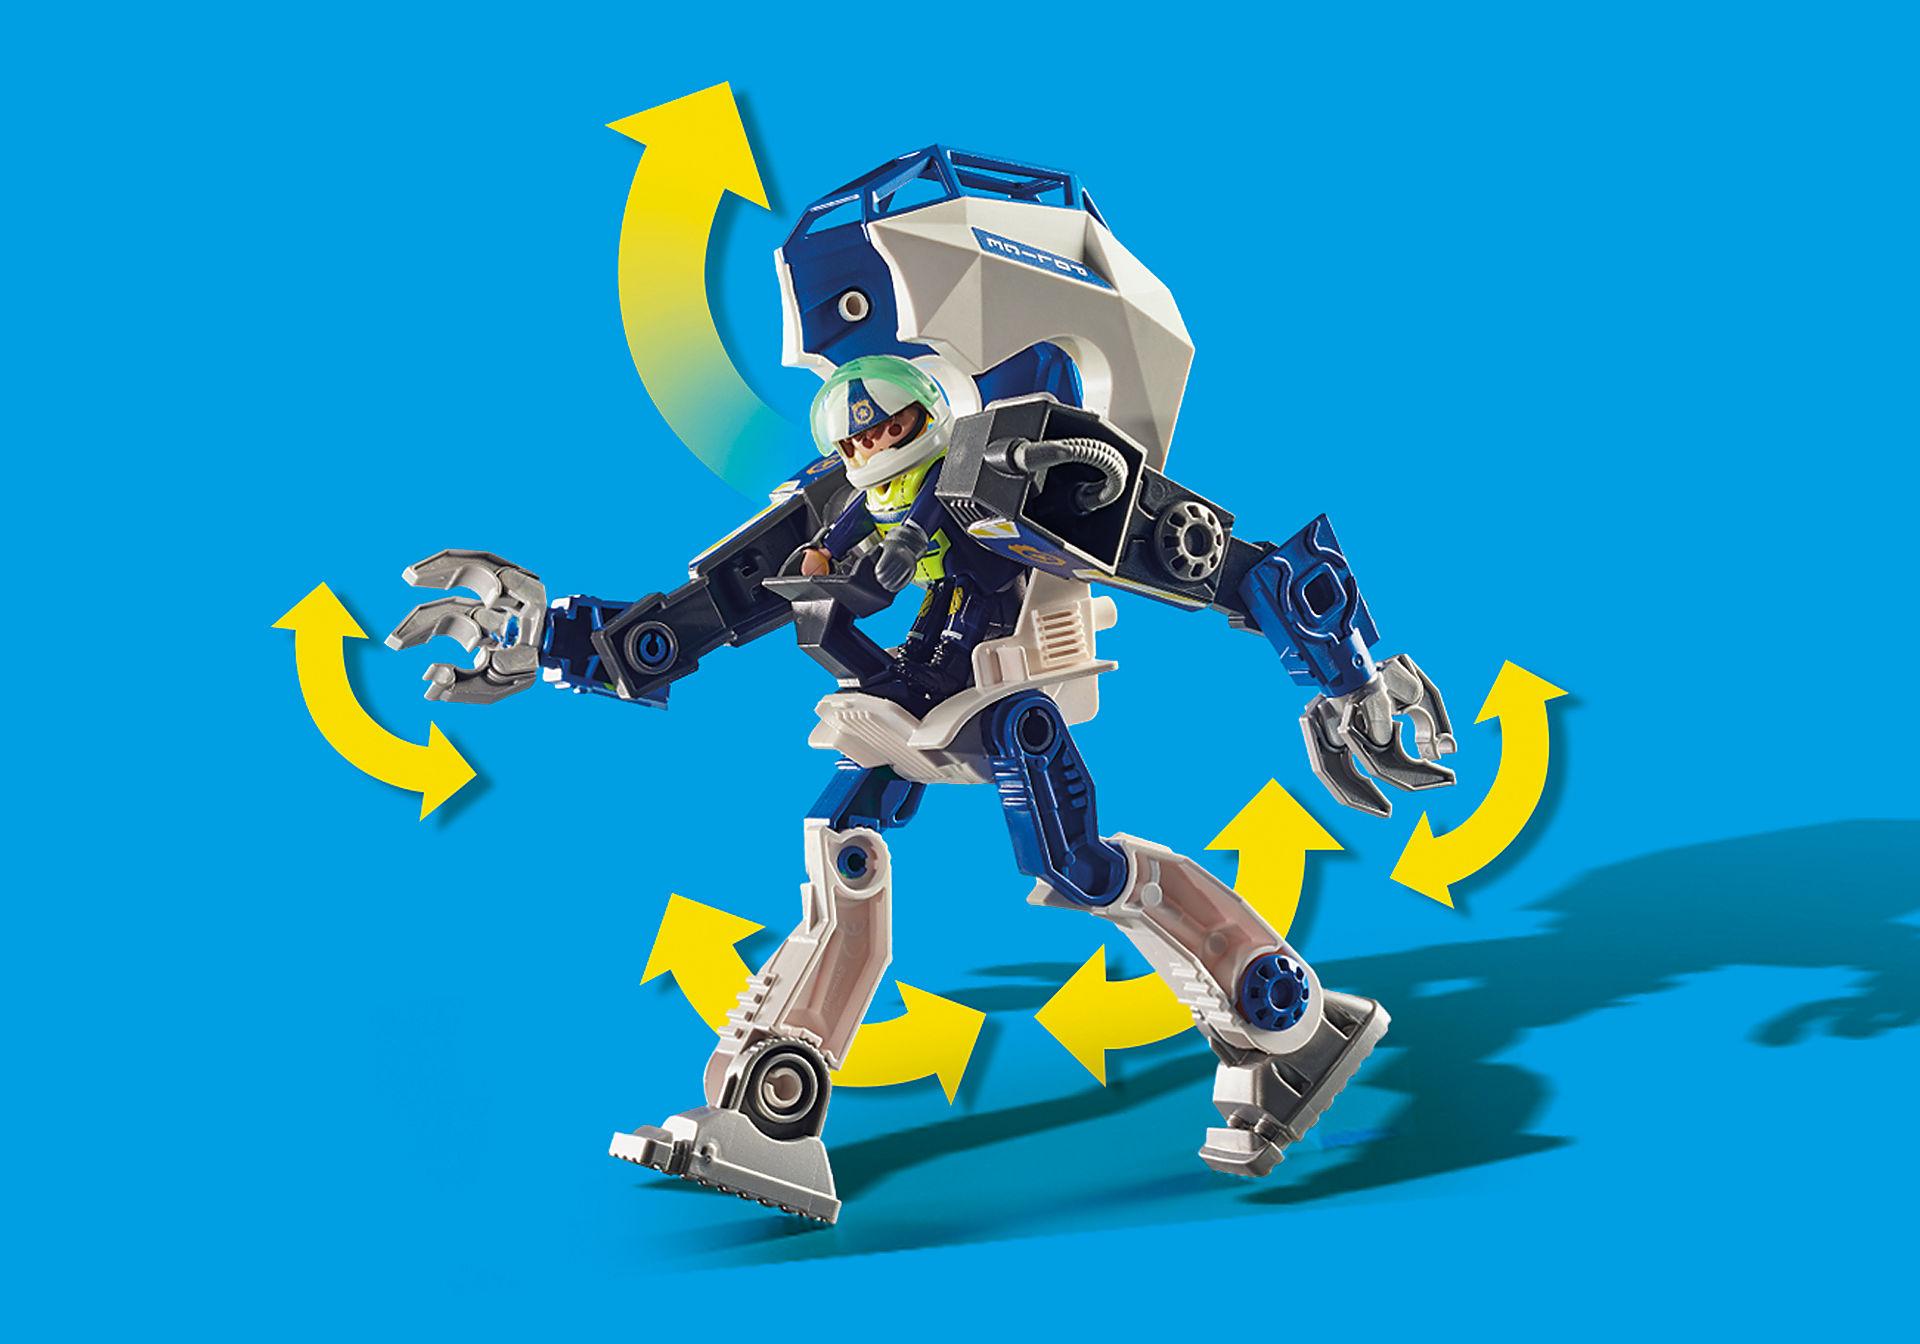 70571 Robot Policía: operación Especial zoom image7